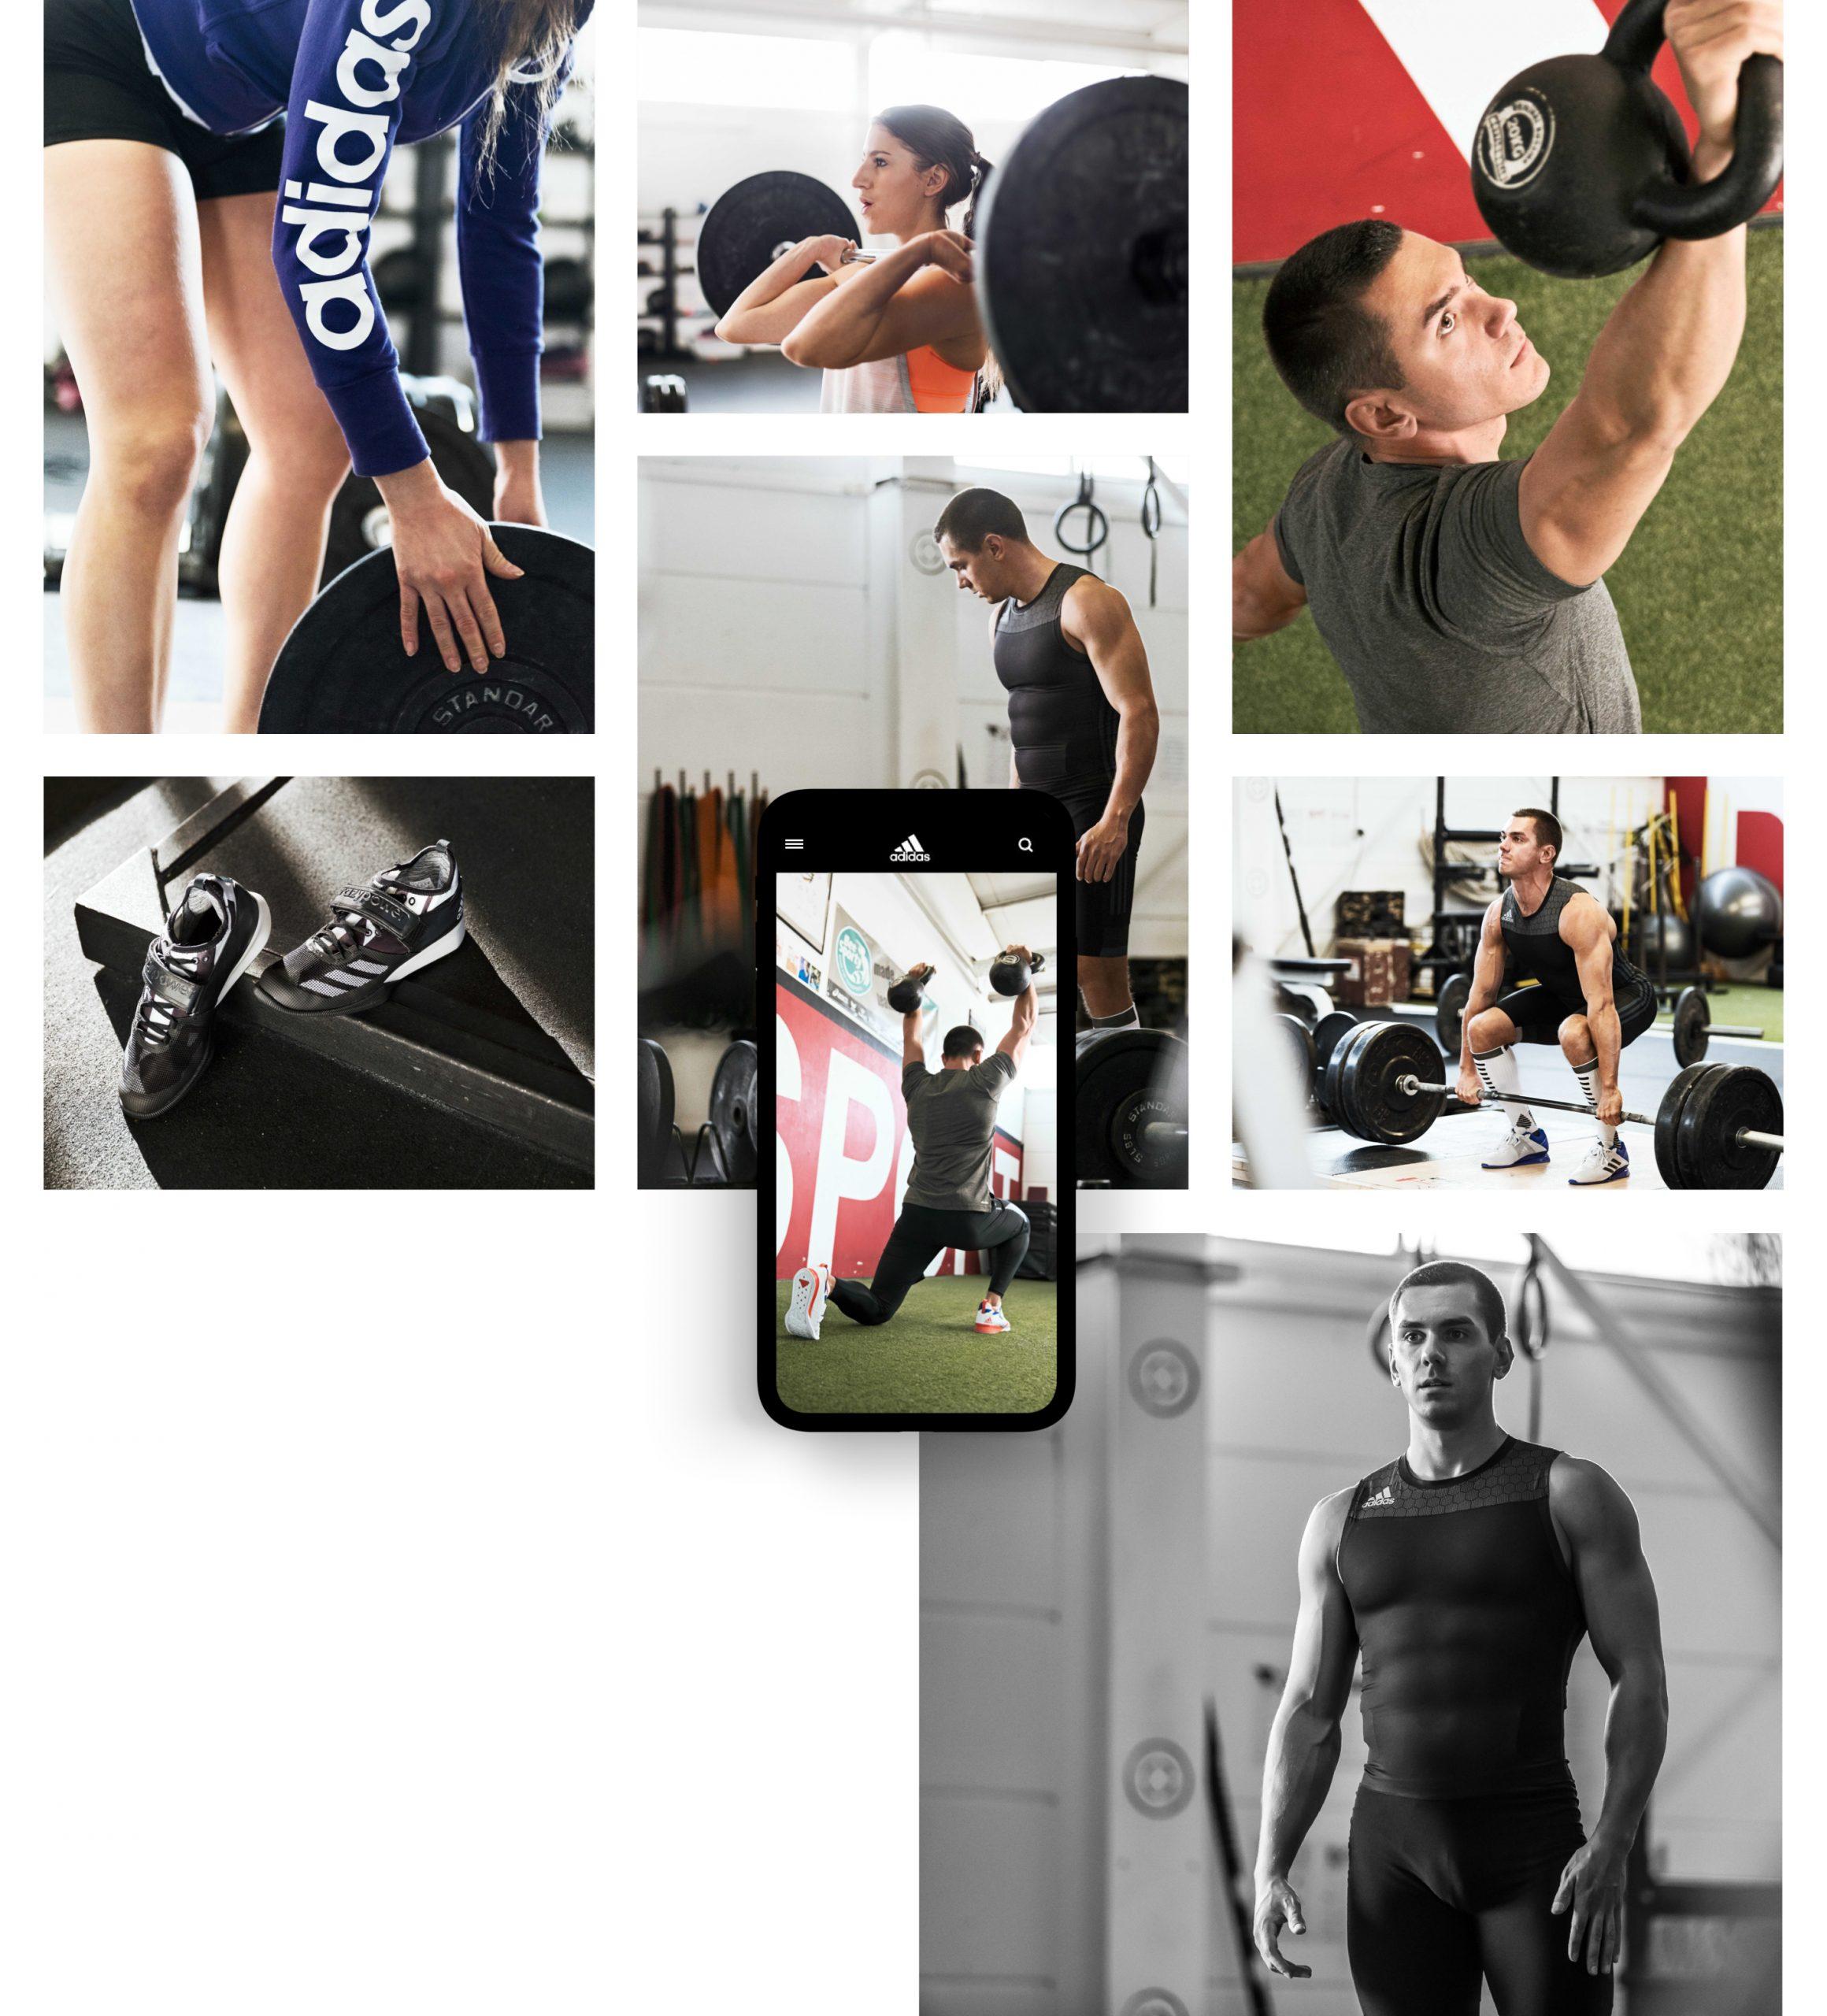 pascher-heinz-adidas-weightlifting-visual-03